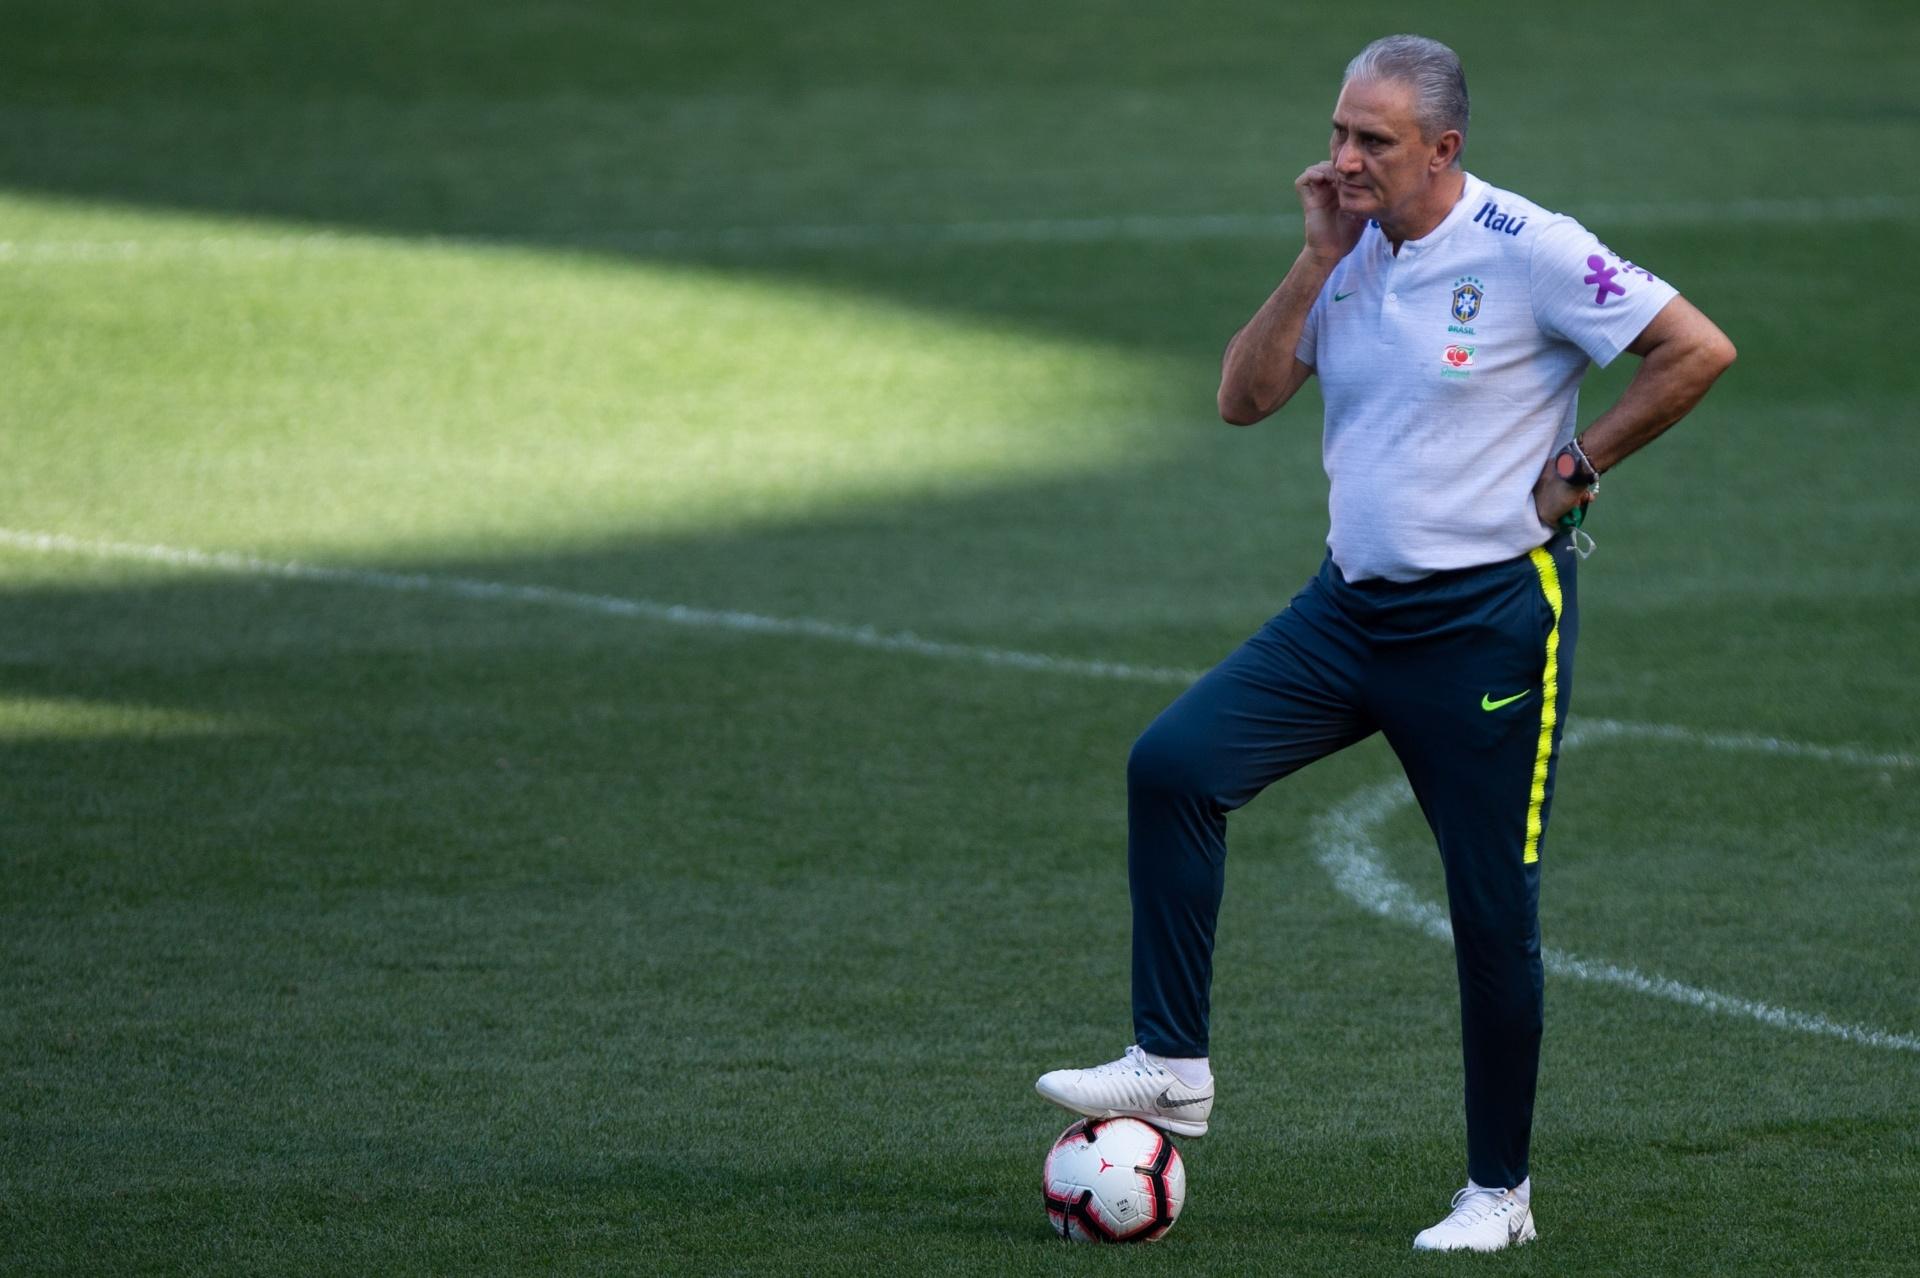 3c52e4ed90 CBF confirma amistoso contra o Uruguai e procura 2º rival para novembro -  09 10 2018 - UOL Esporte